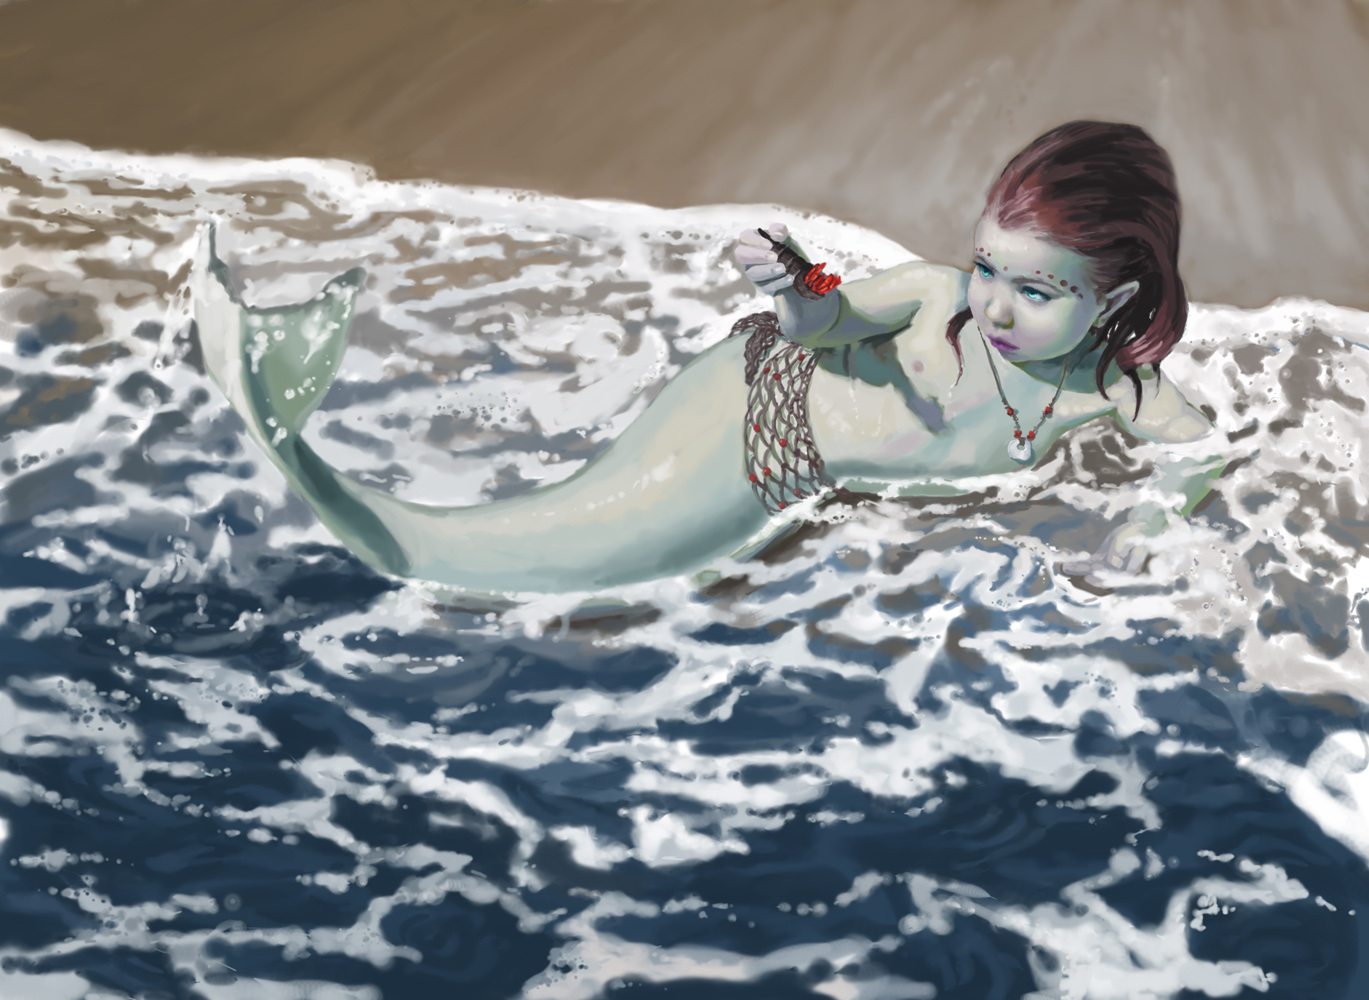 Real mermaids found on beach